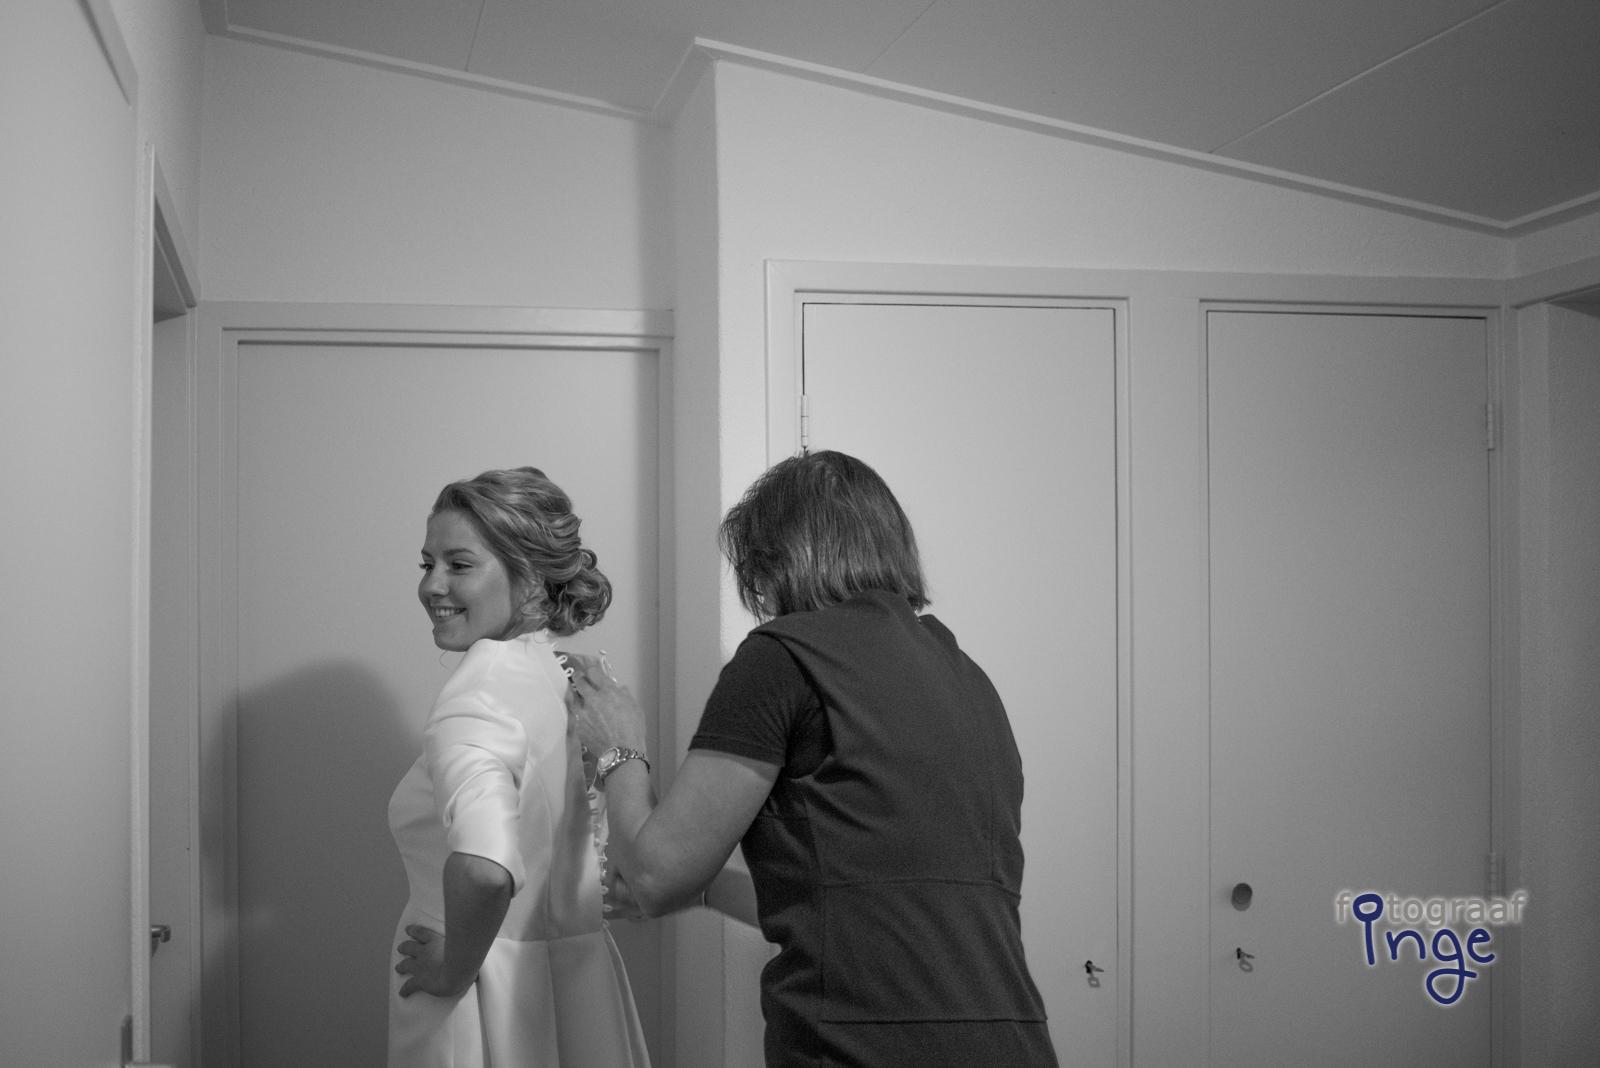 Fotograaf_Inge_Bruiloft_Henk_Margriet-4